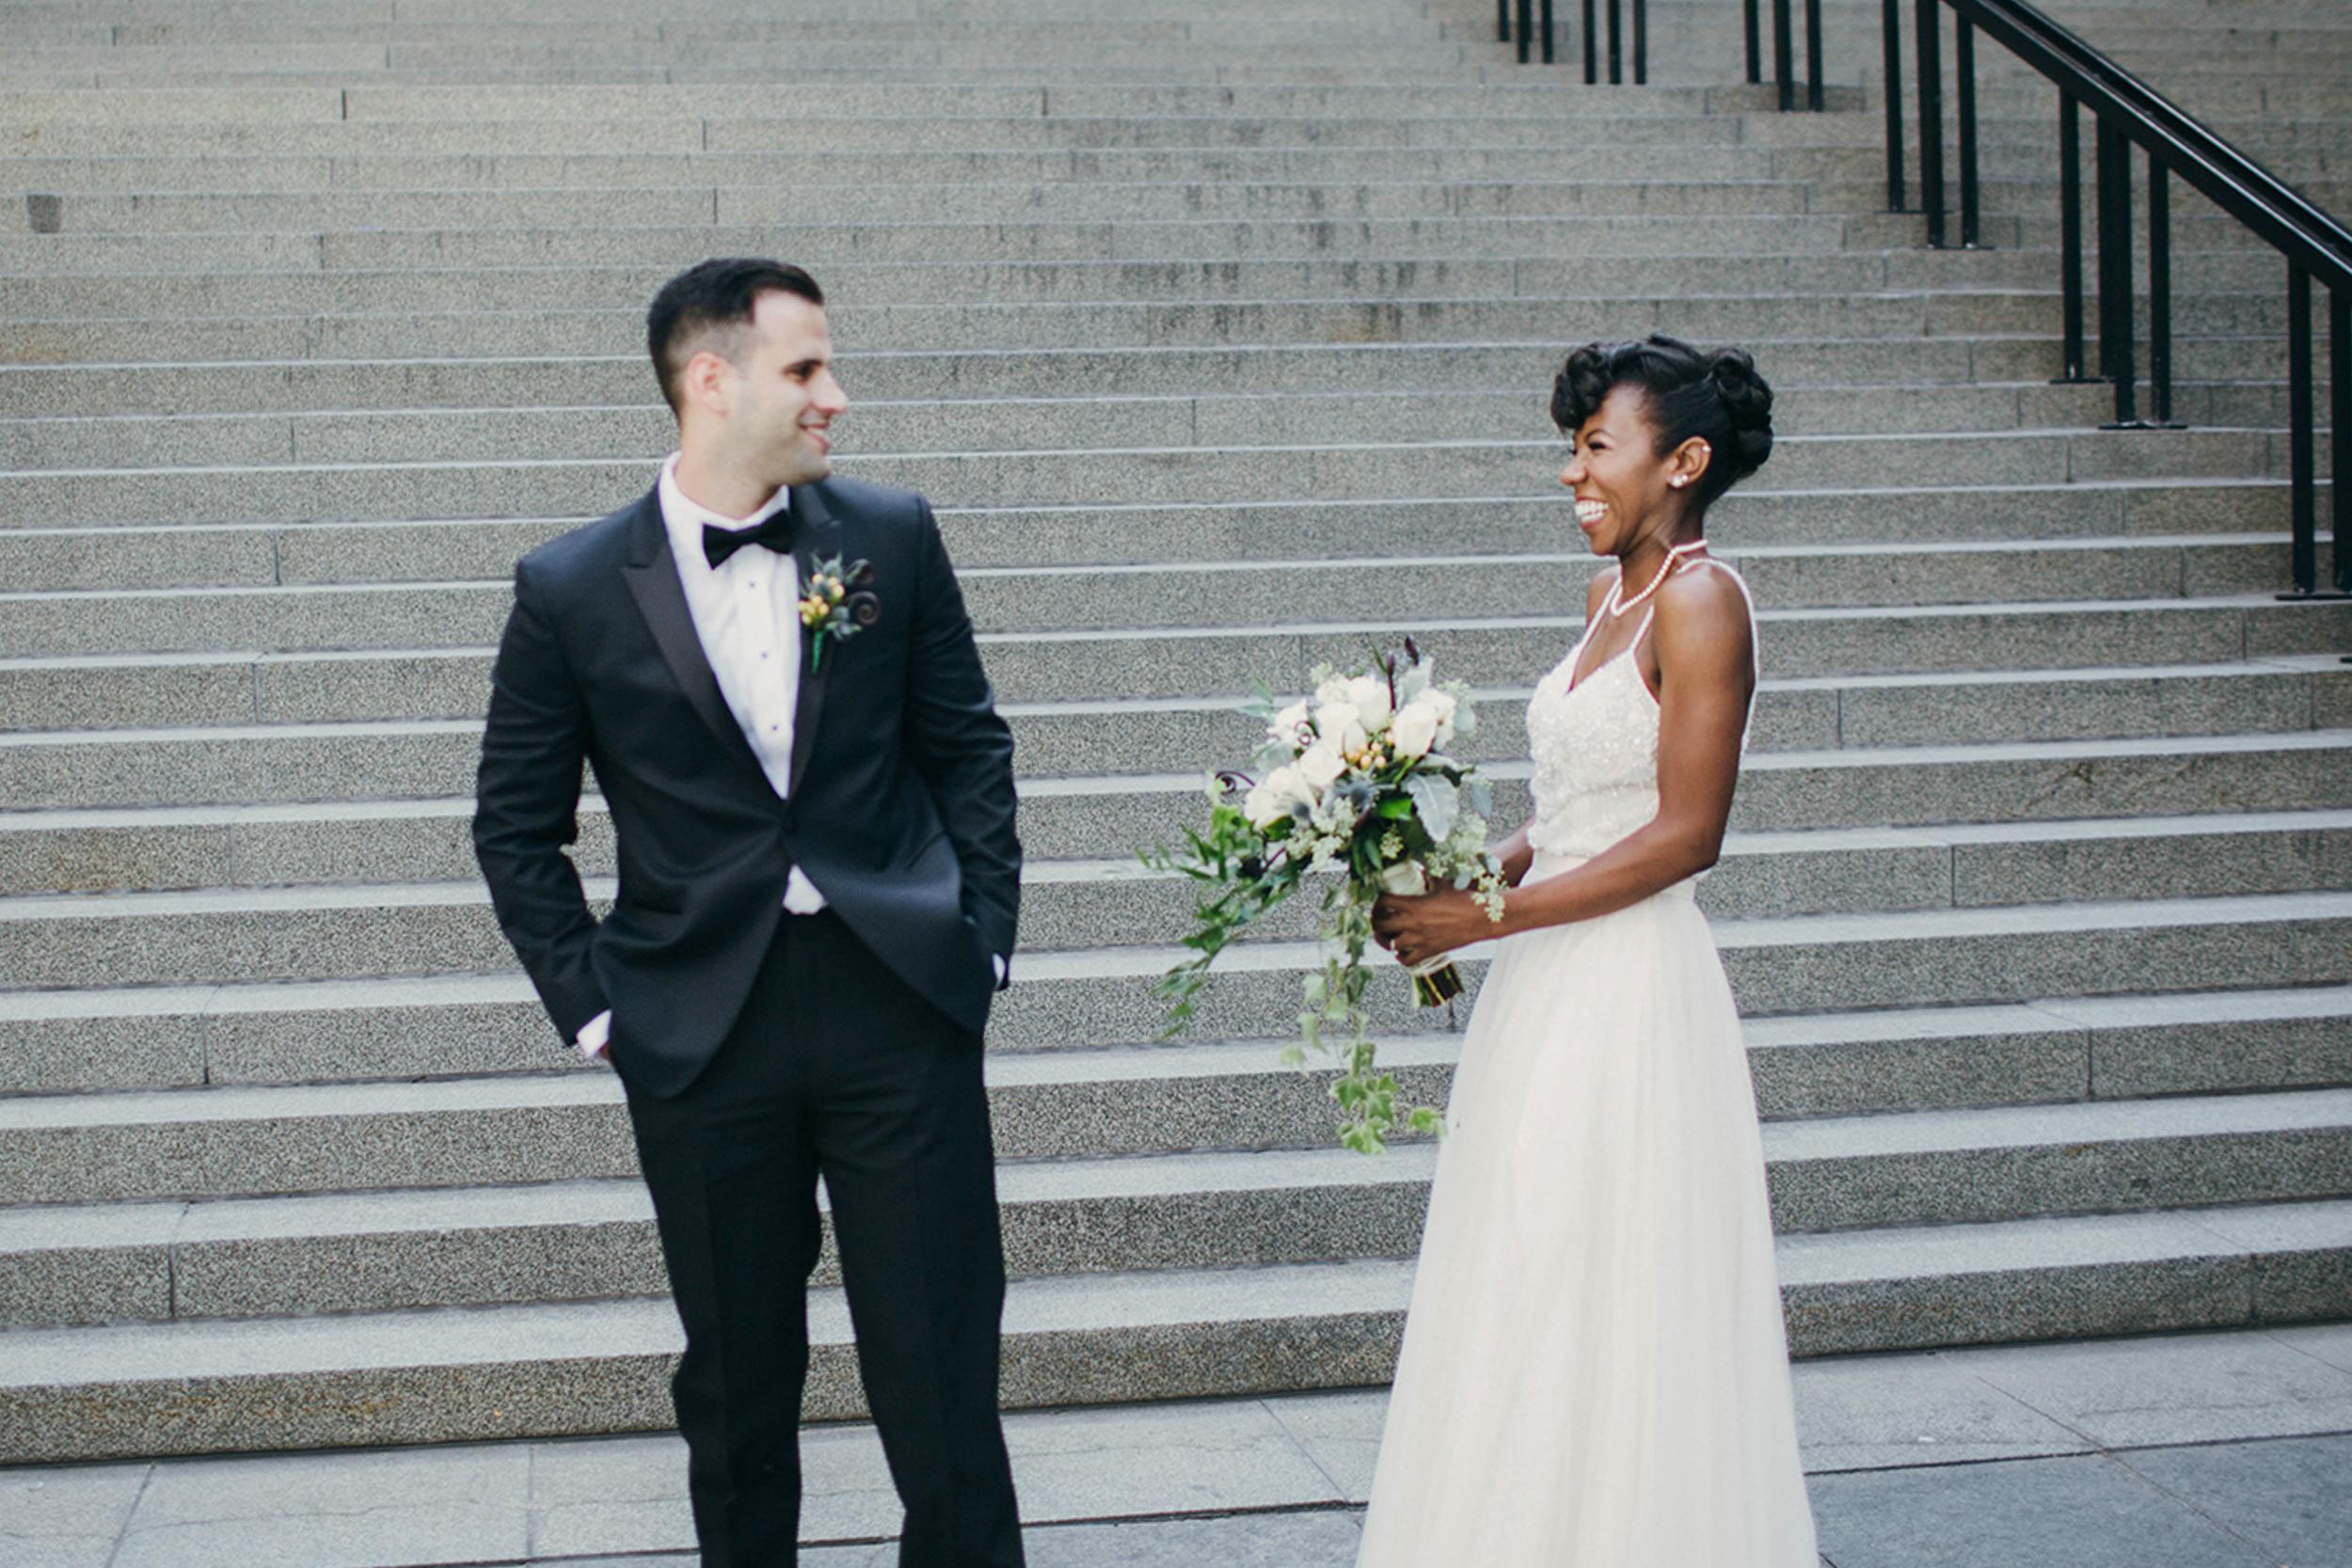 chicago.wedding.urban.intimate.zed451.lake.milton olive park-25.jpg